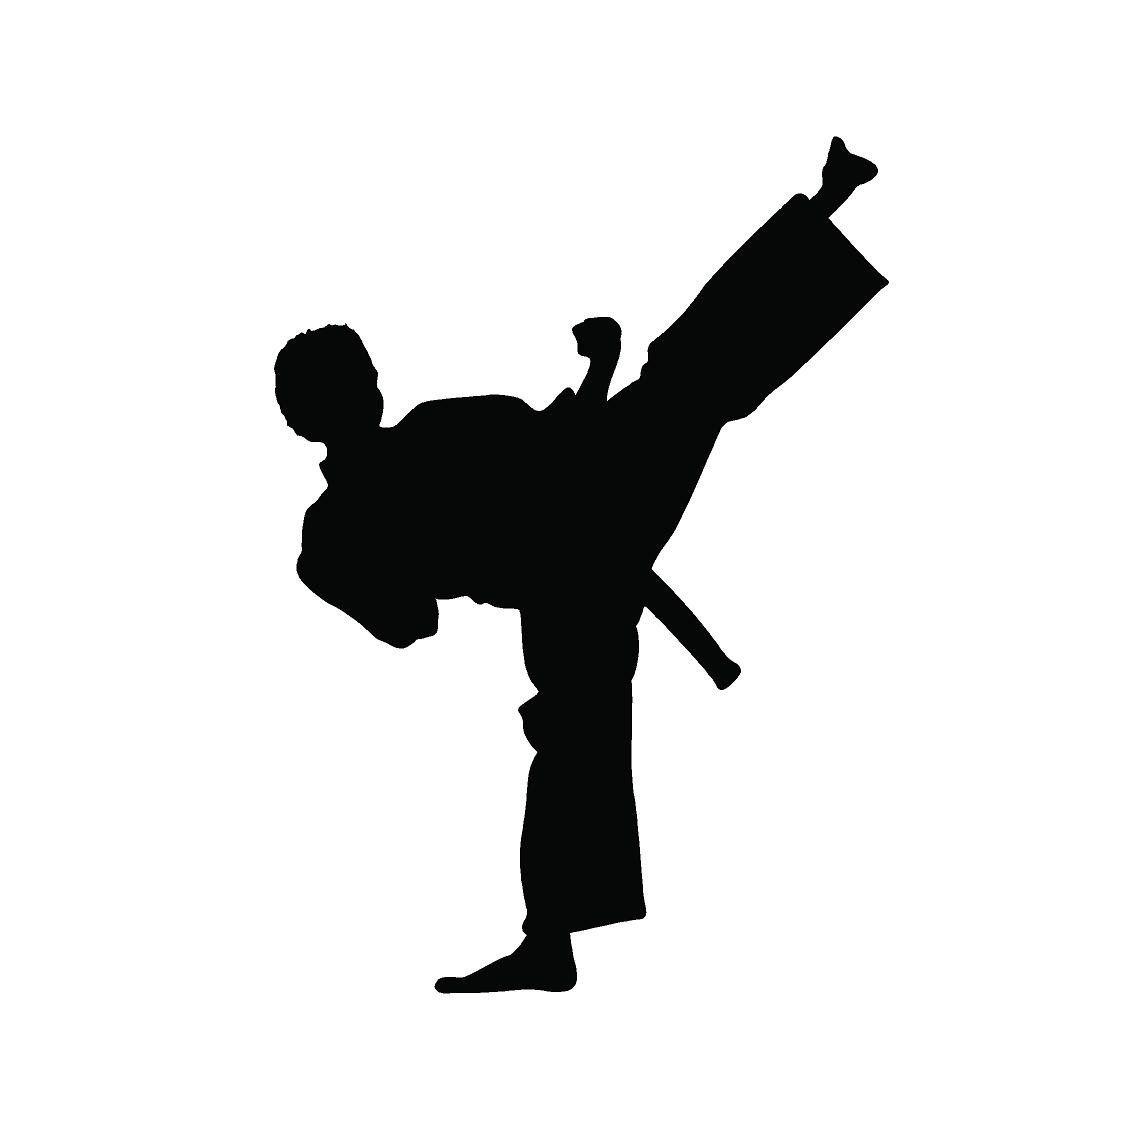 Karate Martial Arts Silhouette Decals Custom Vinyl Laptop Car Truck Window Stickers Martial Arts Karate Martial Arts Custom Vinyl [ 1136 x 1139 Pixel ]